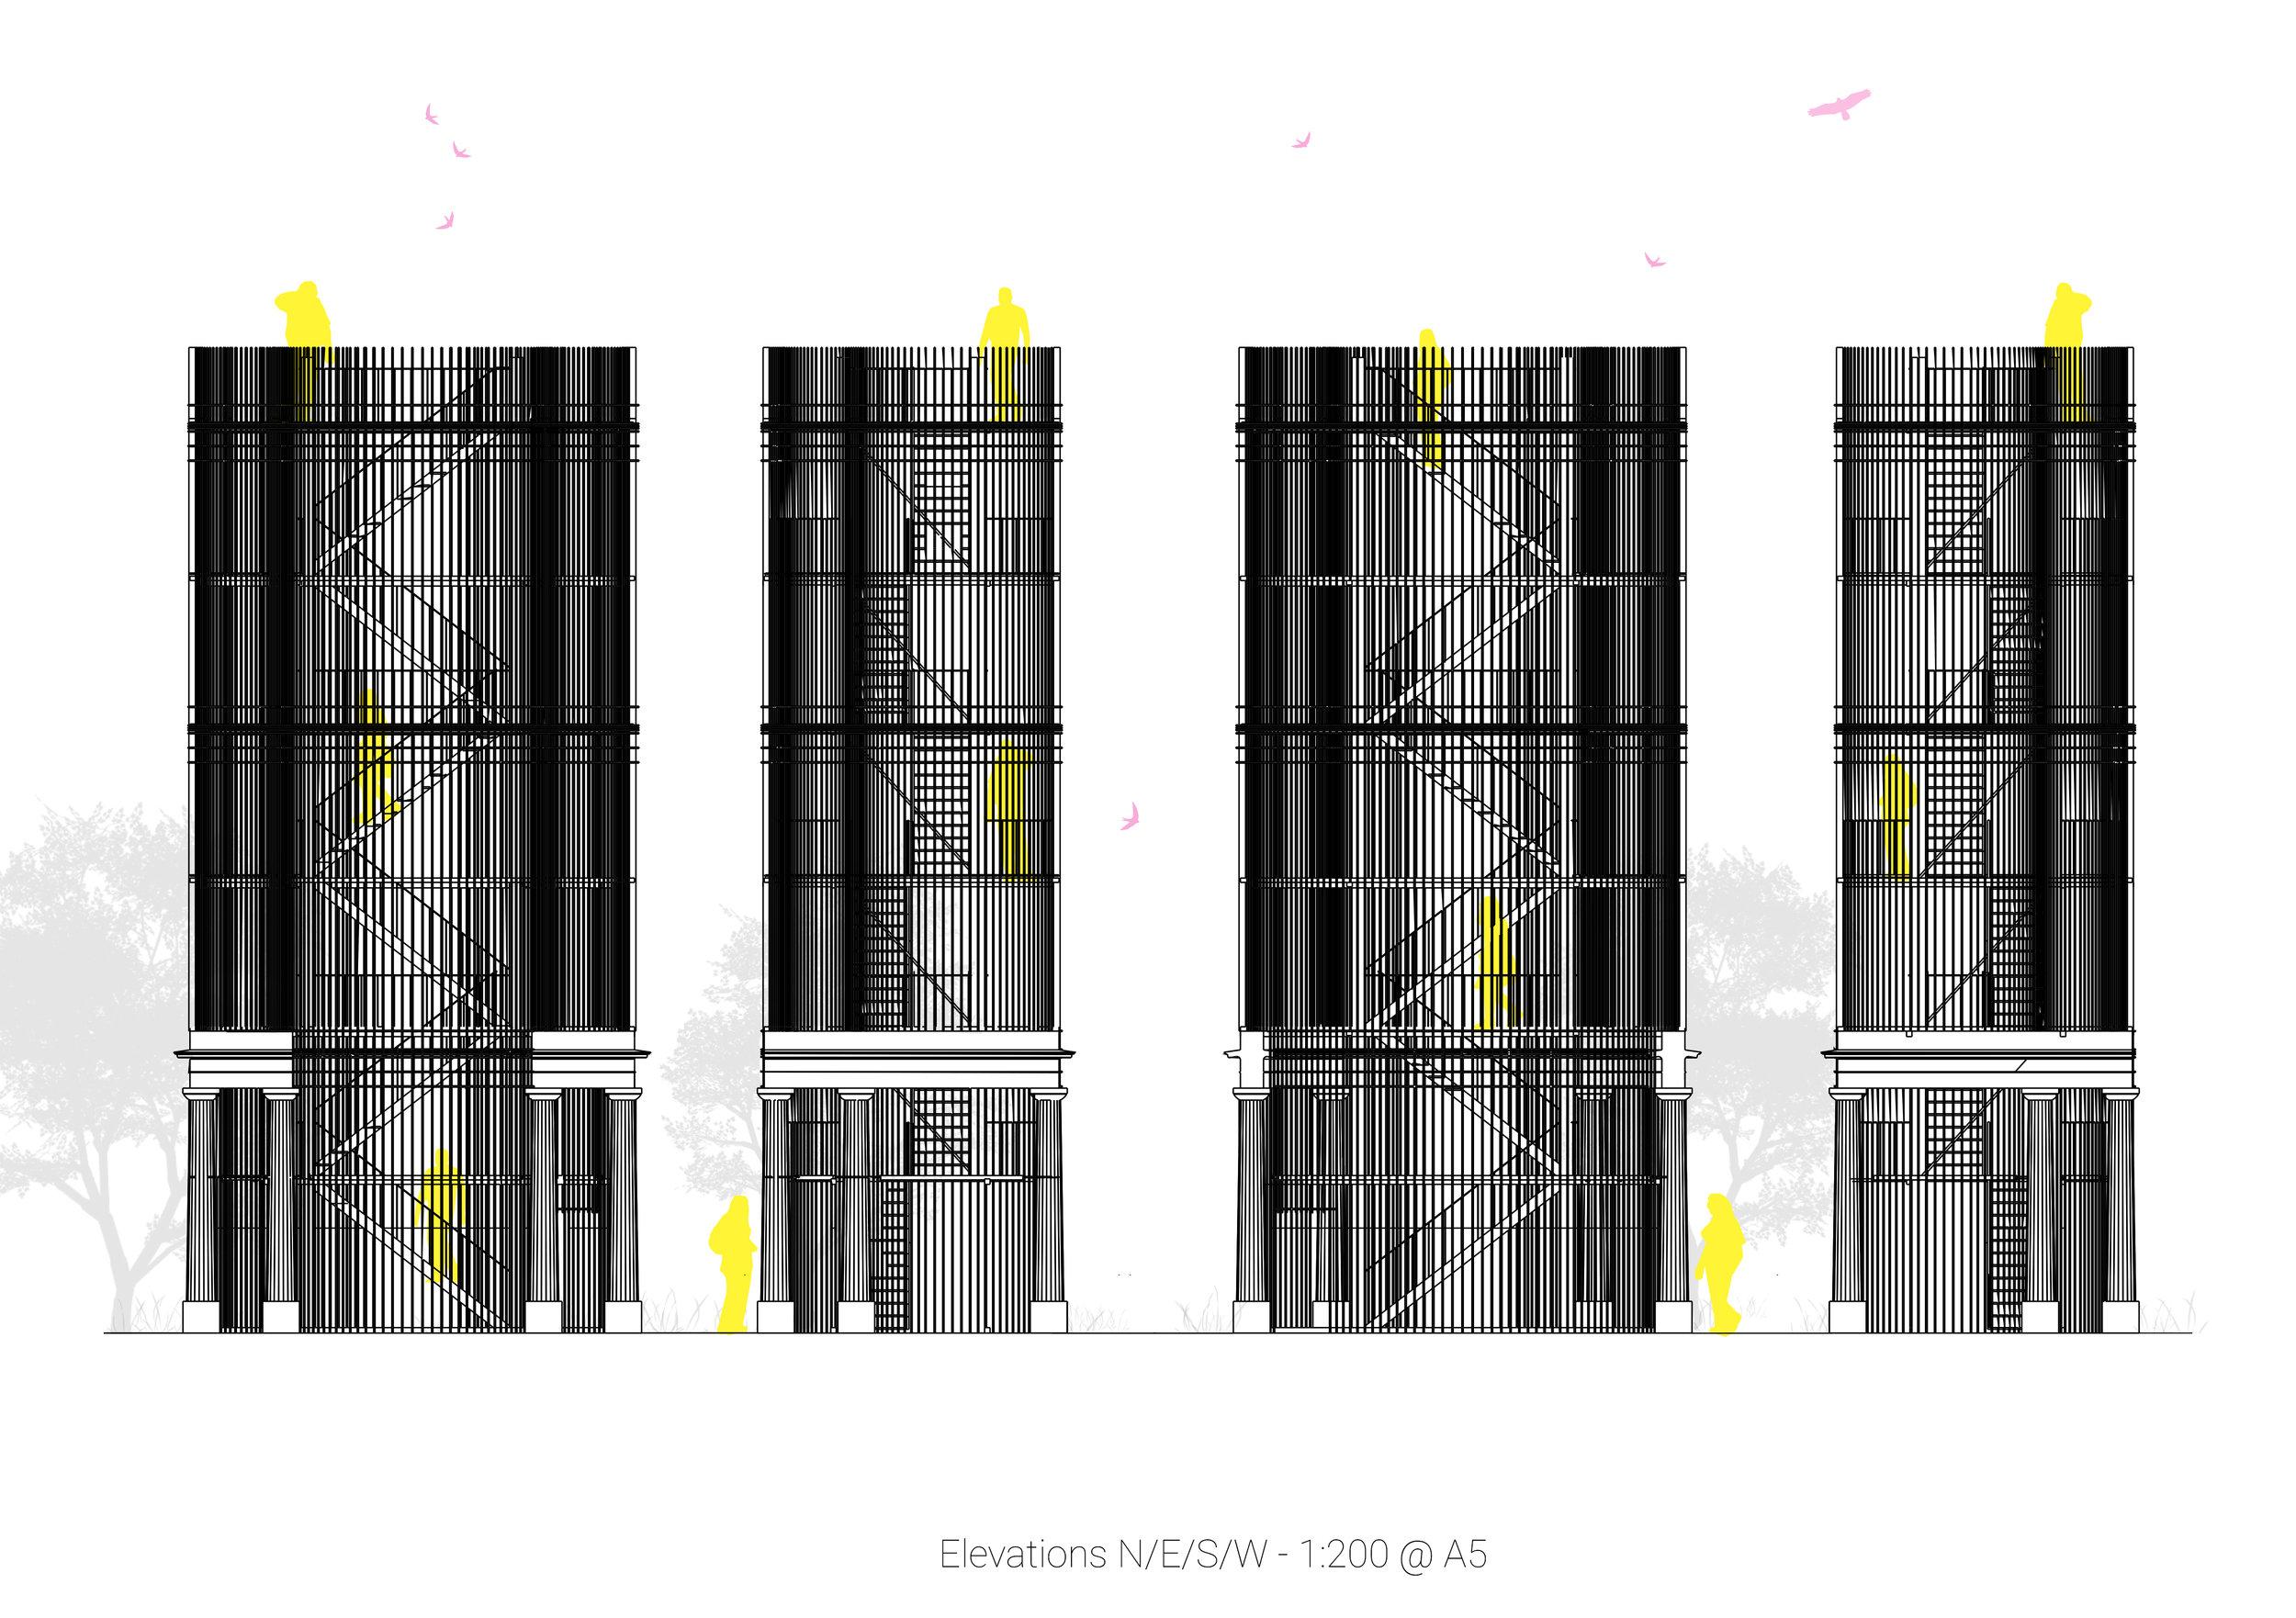 Felix Wilson - Felix-Wilson-TheArchiologist-Tower_III-5-Elevations_1_200-A5.jpg